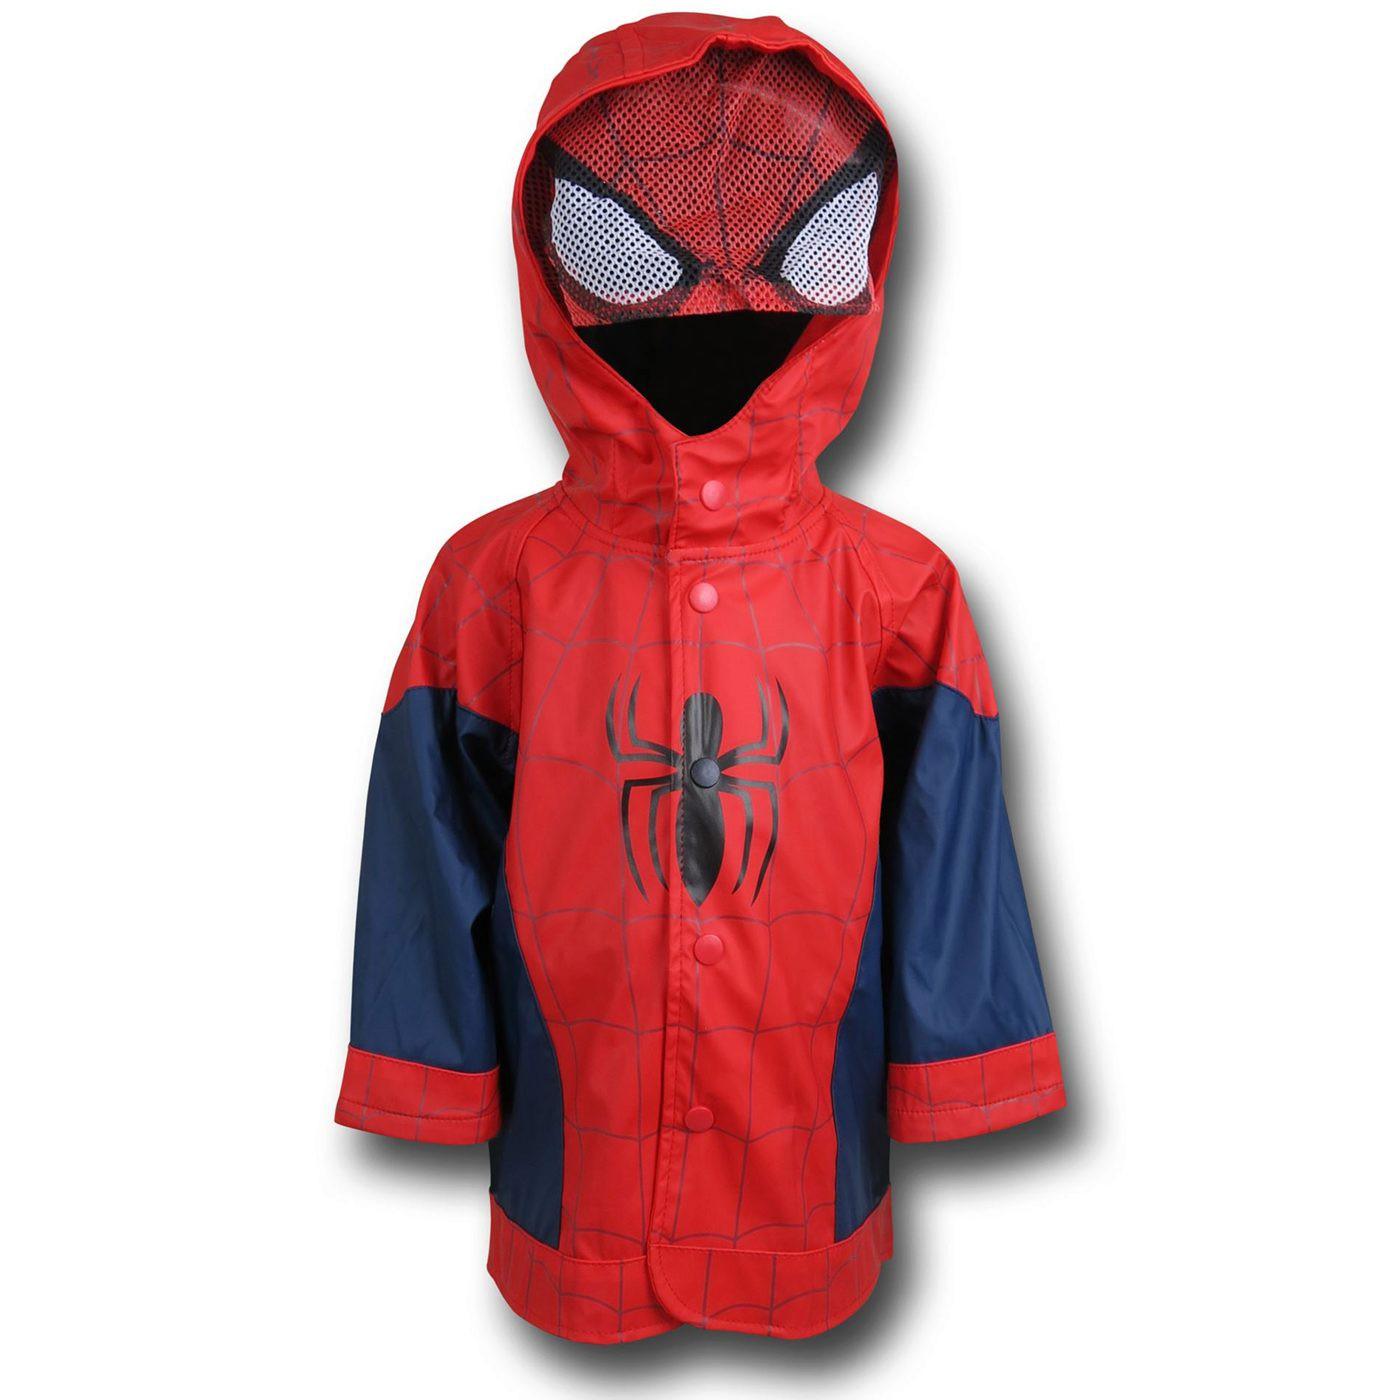 Spiderman Kids Costume Rain Coat